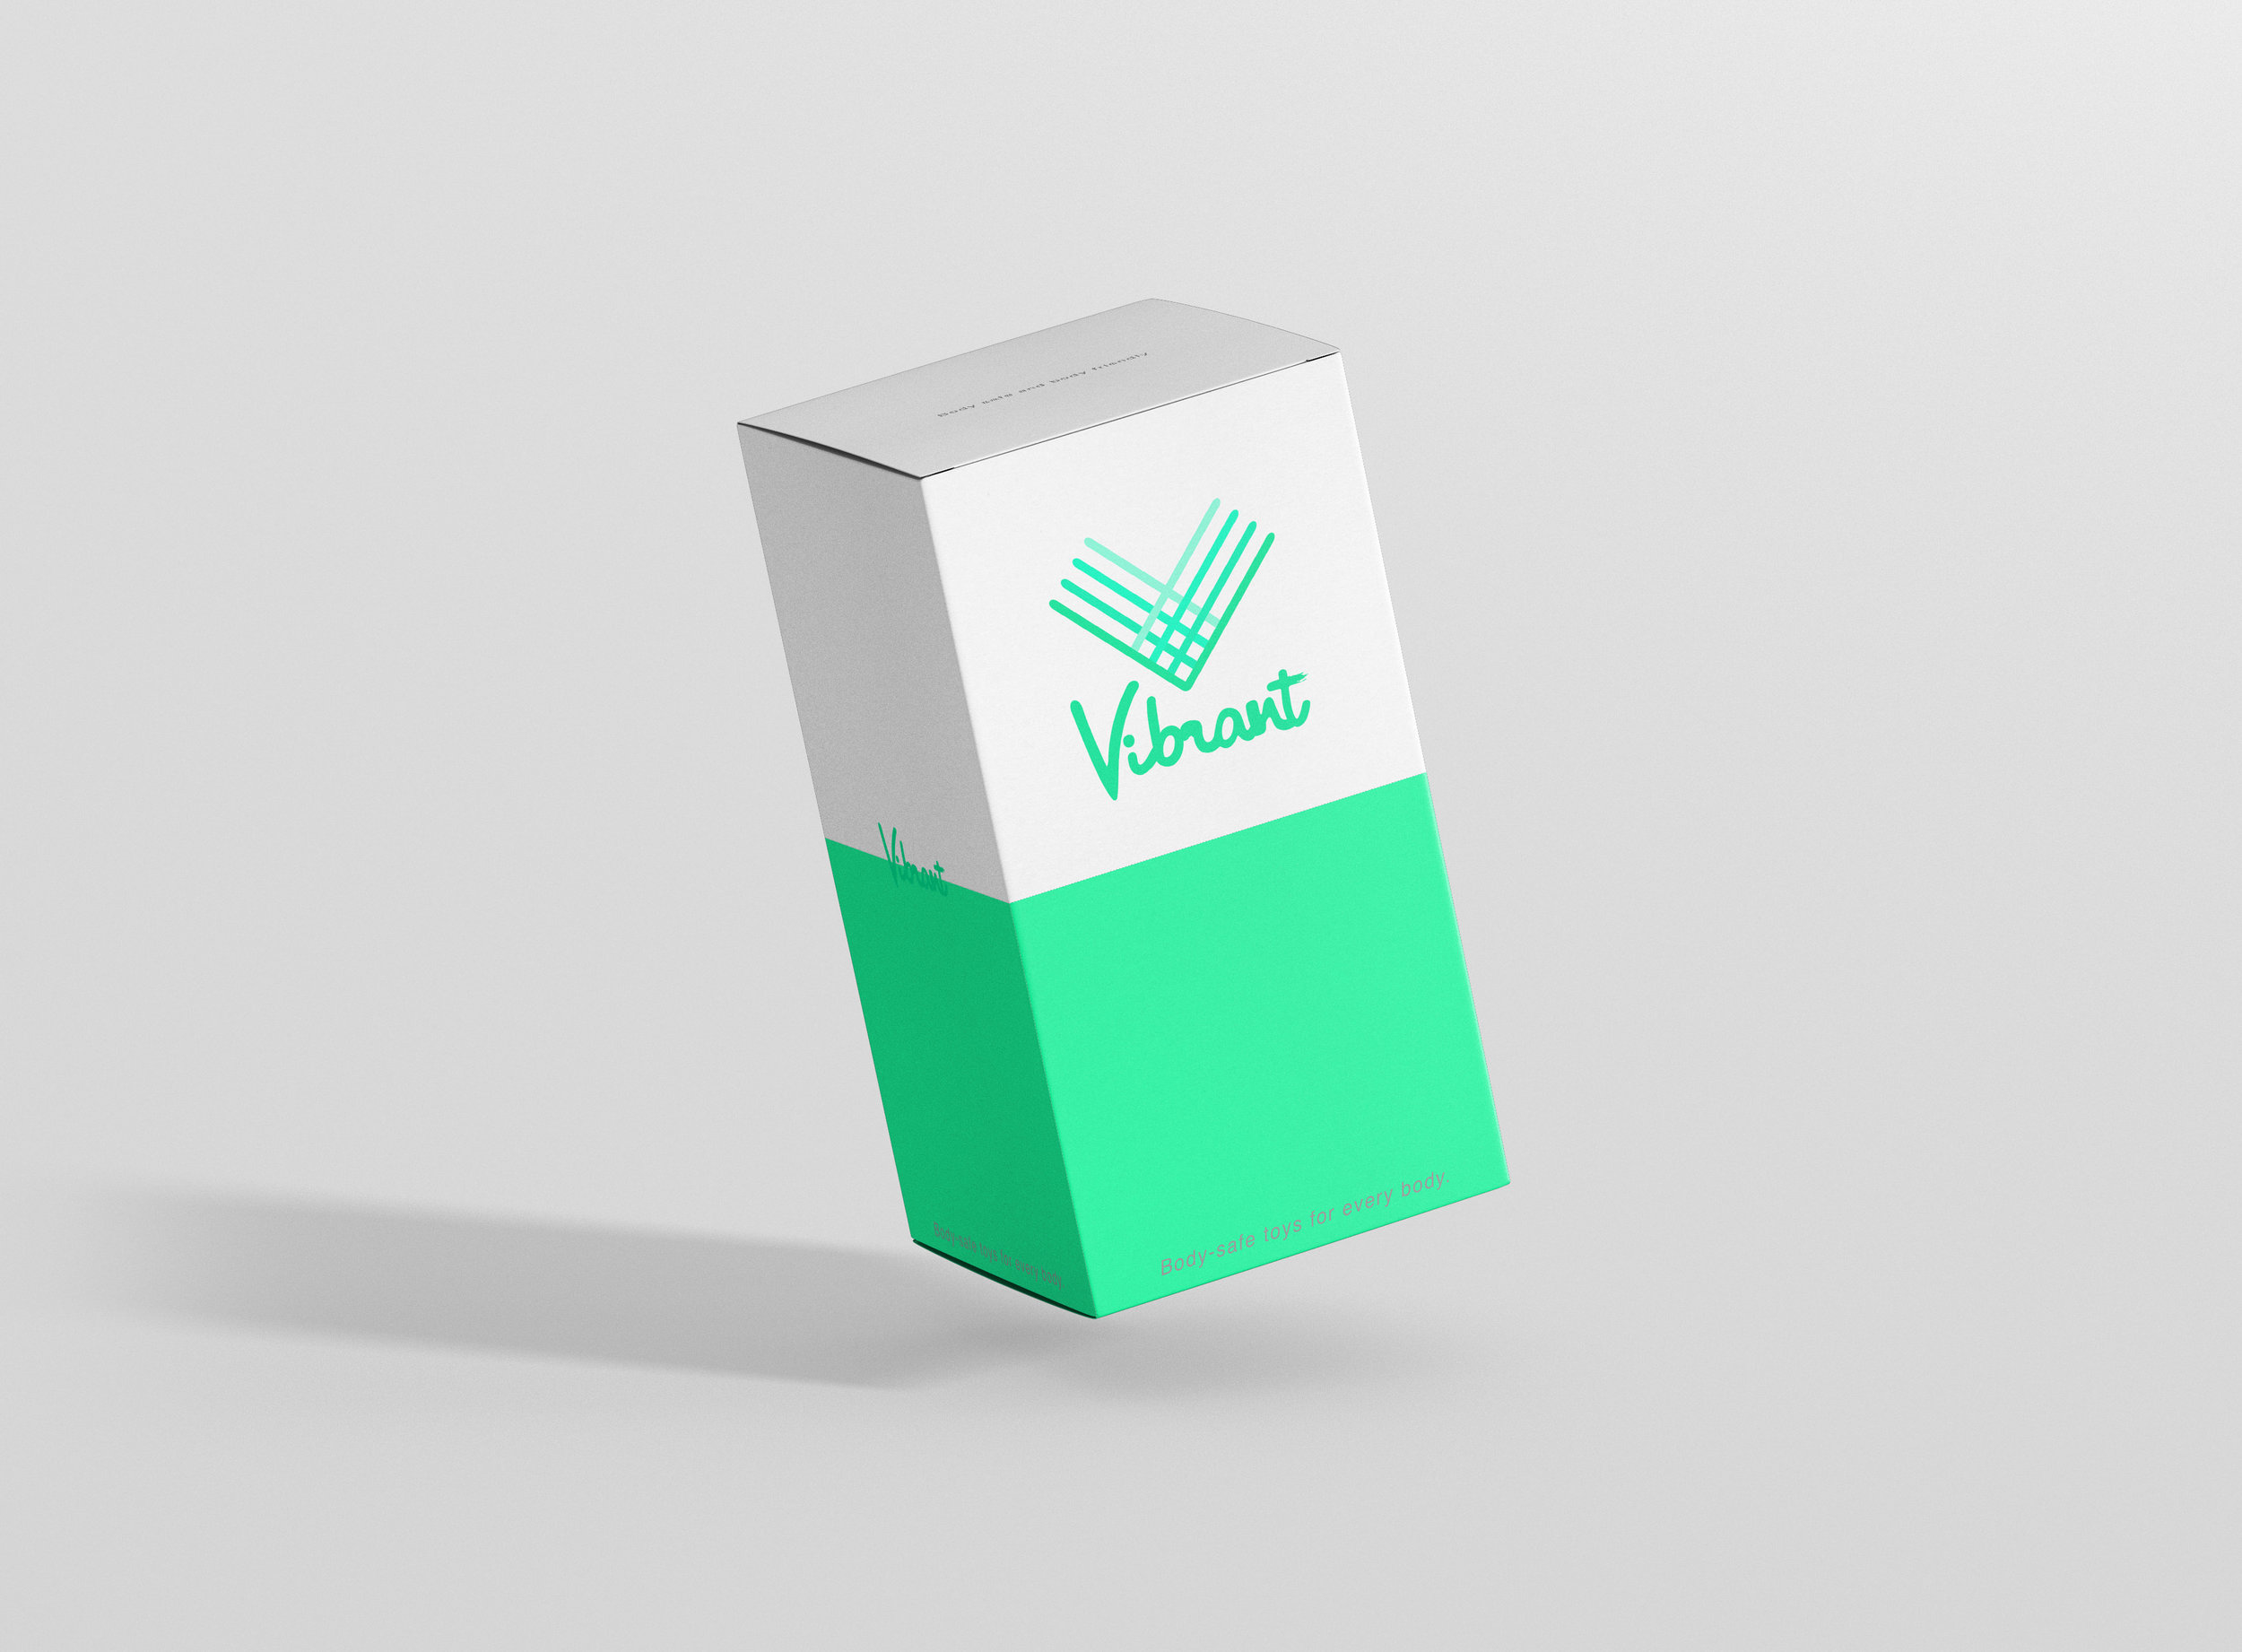 packagedesign_box1.jpg